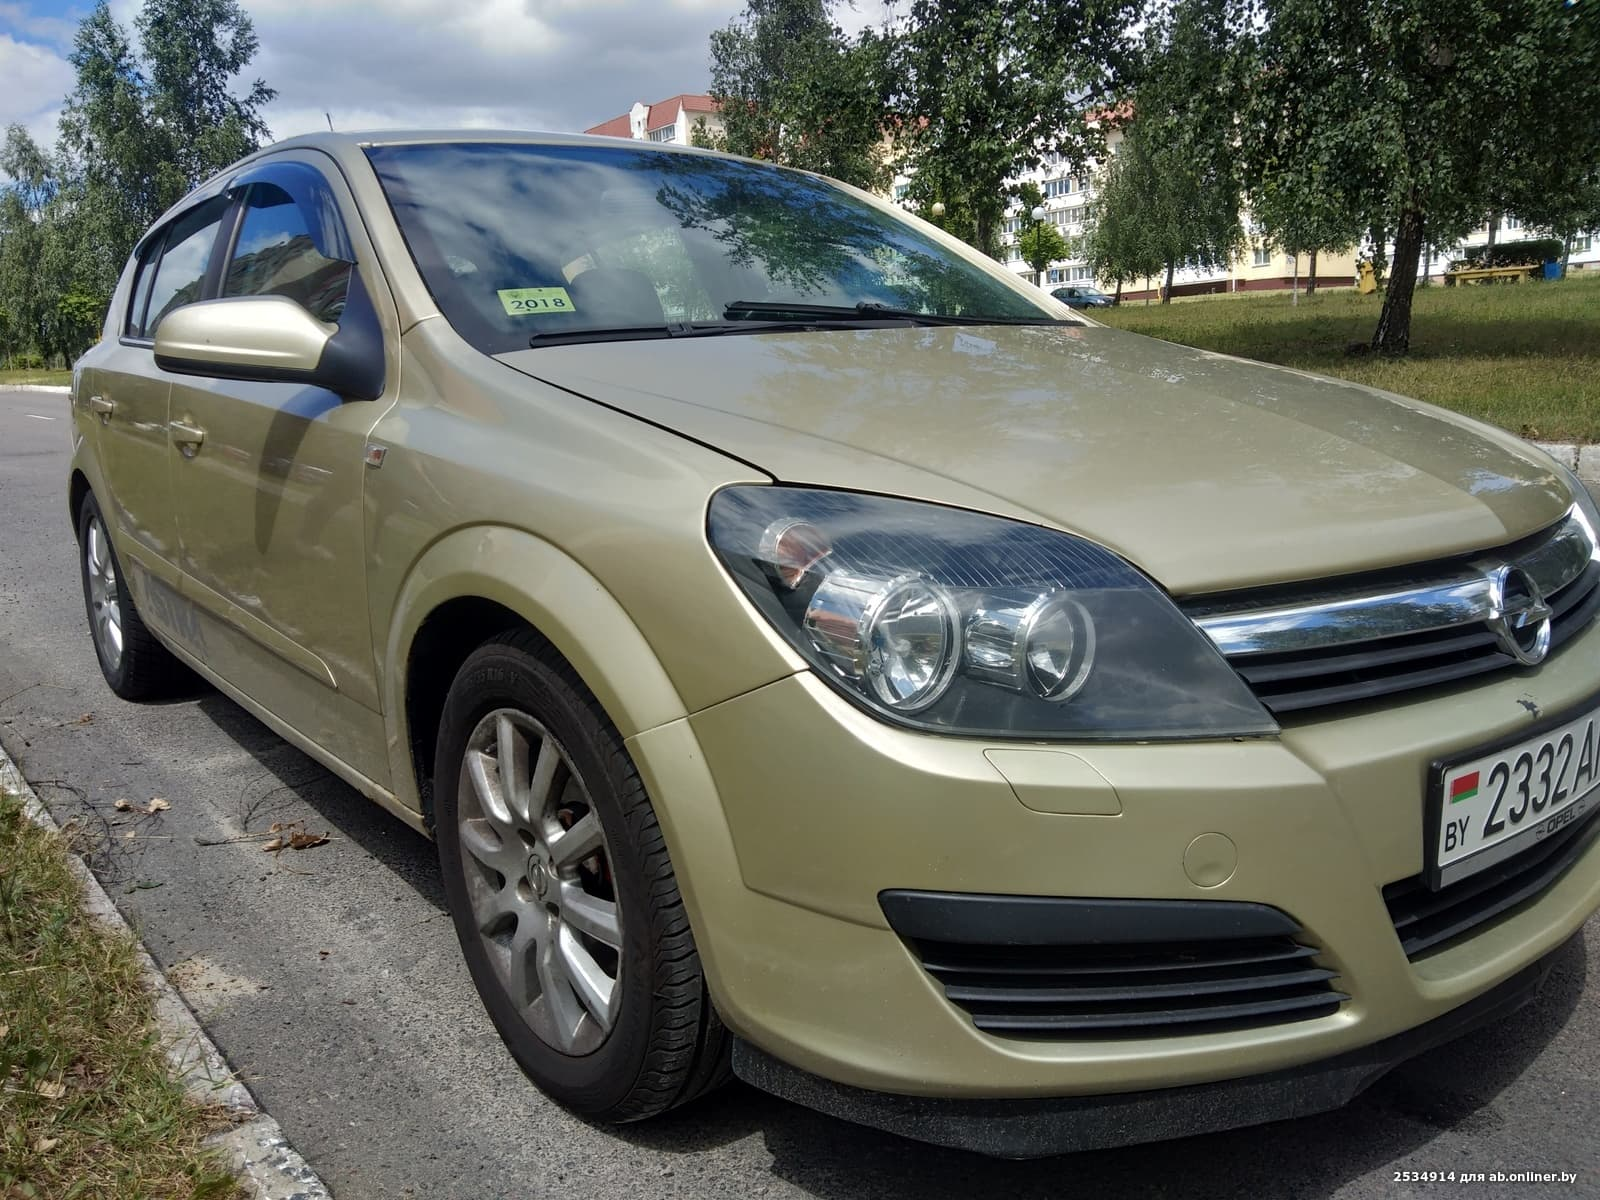 Opel Astra 1.6 TVINPORT